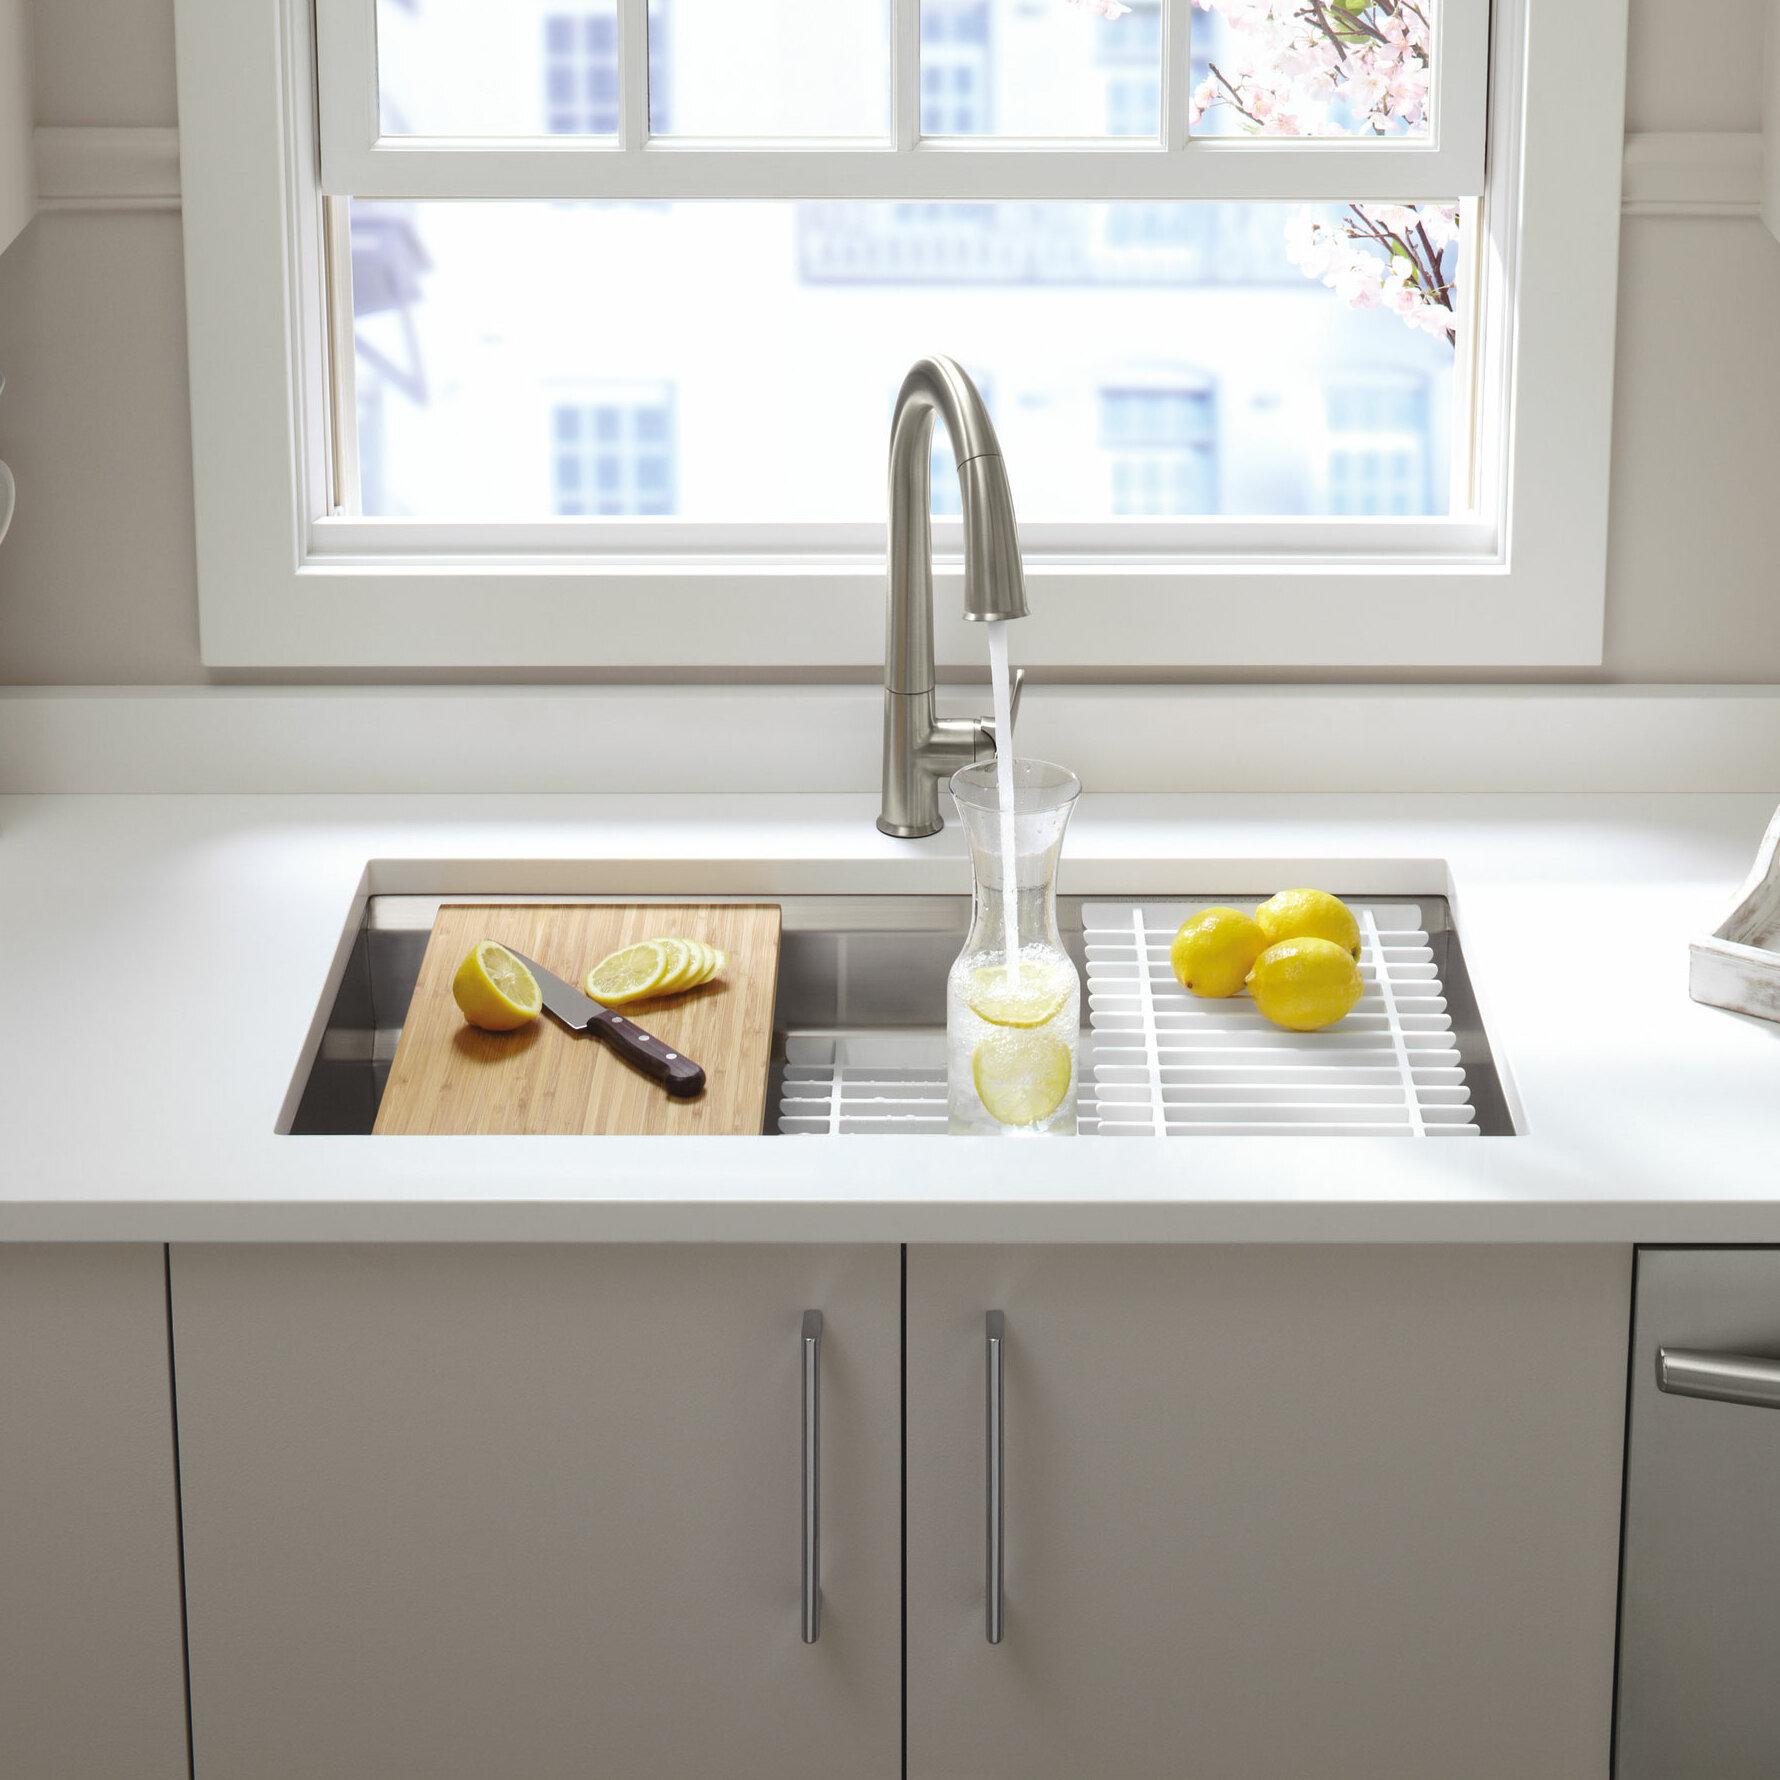 K 5540 Na Prolific 33 L X 17 3 4 W 11 Undermount Single Bowl Kitchen Sink With Accessories